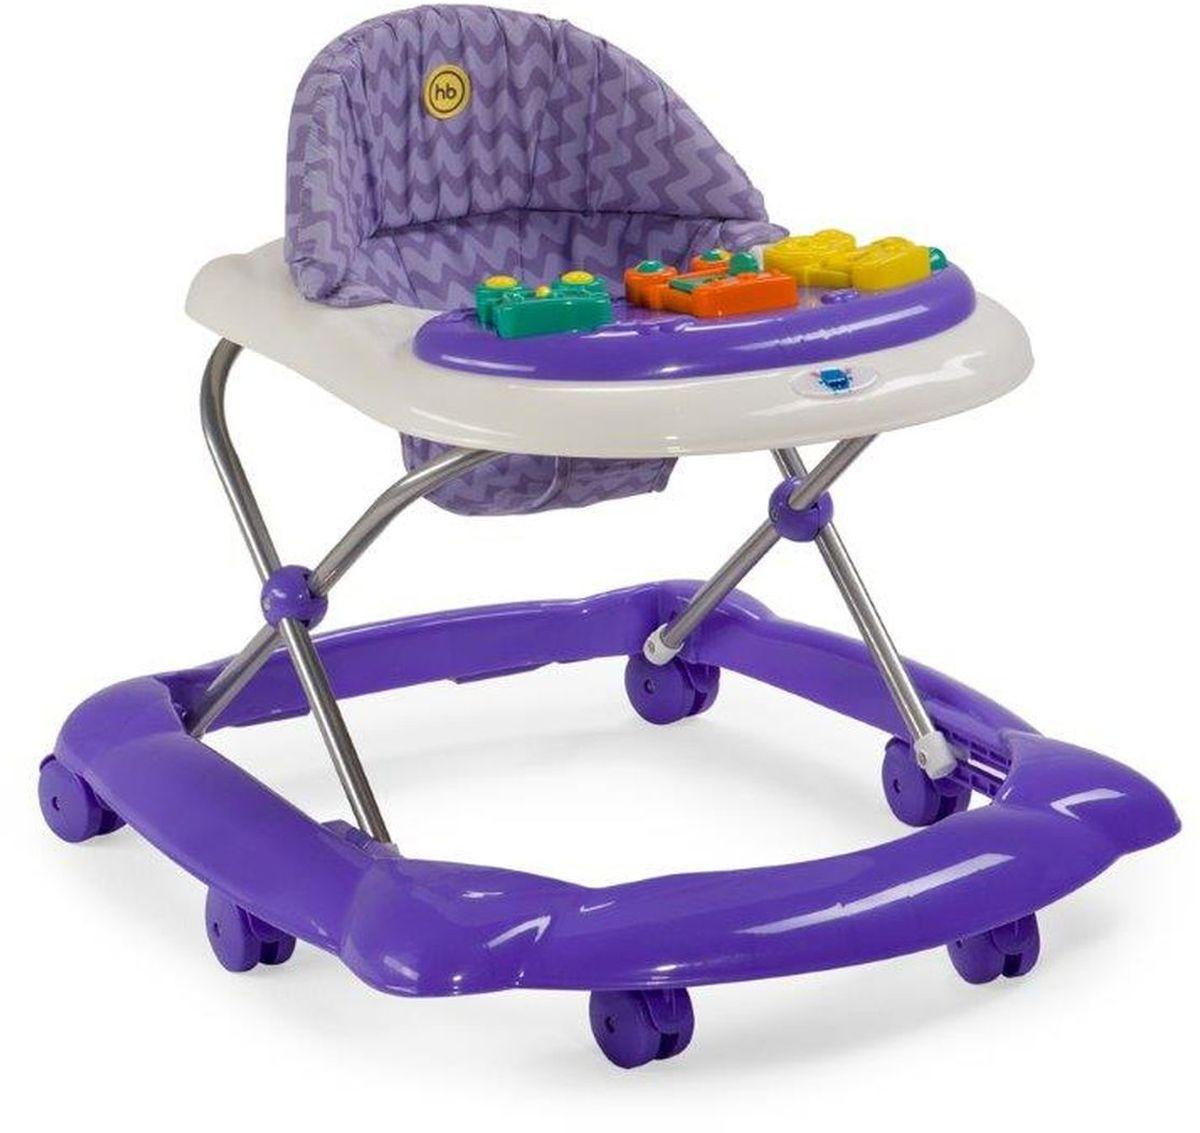 Happy Baby Ходунки Pioneer цвет фиолетовый -  Ходунки, прыгунки, качалки